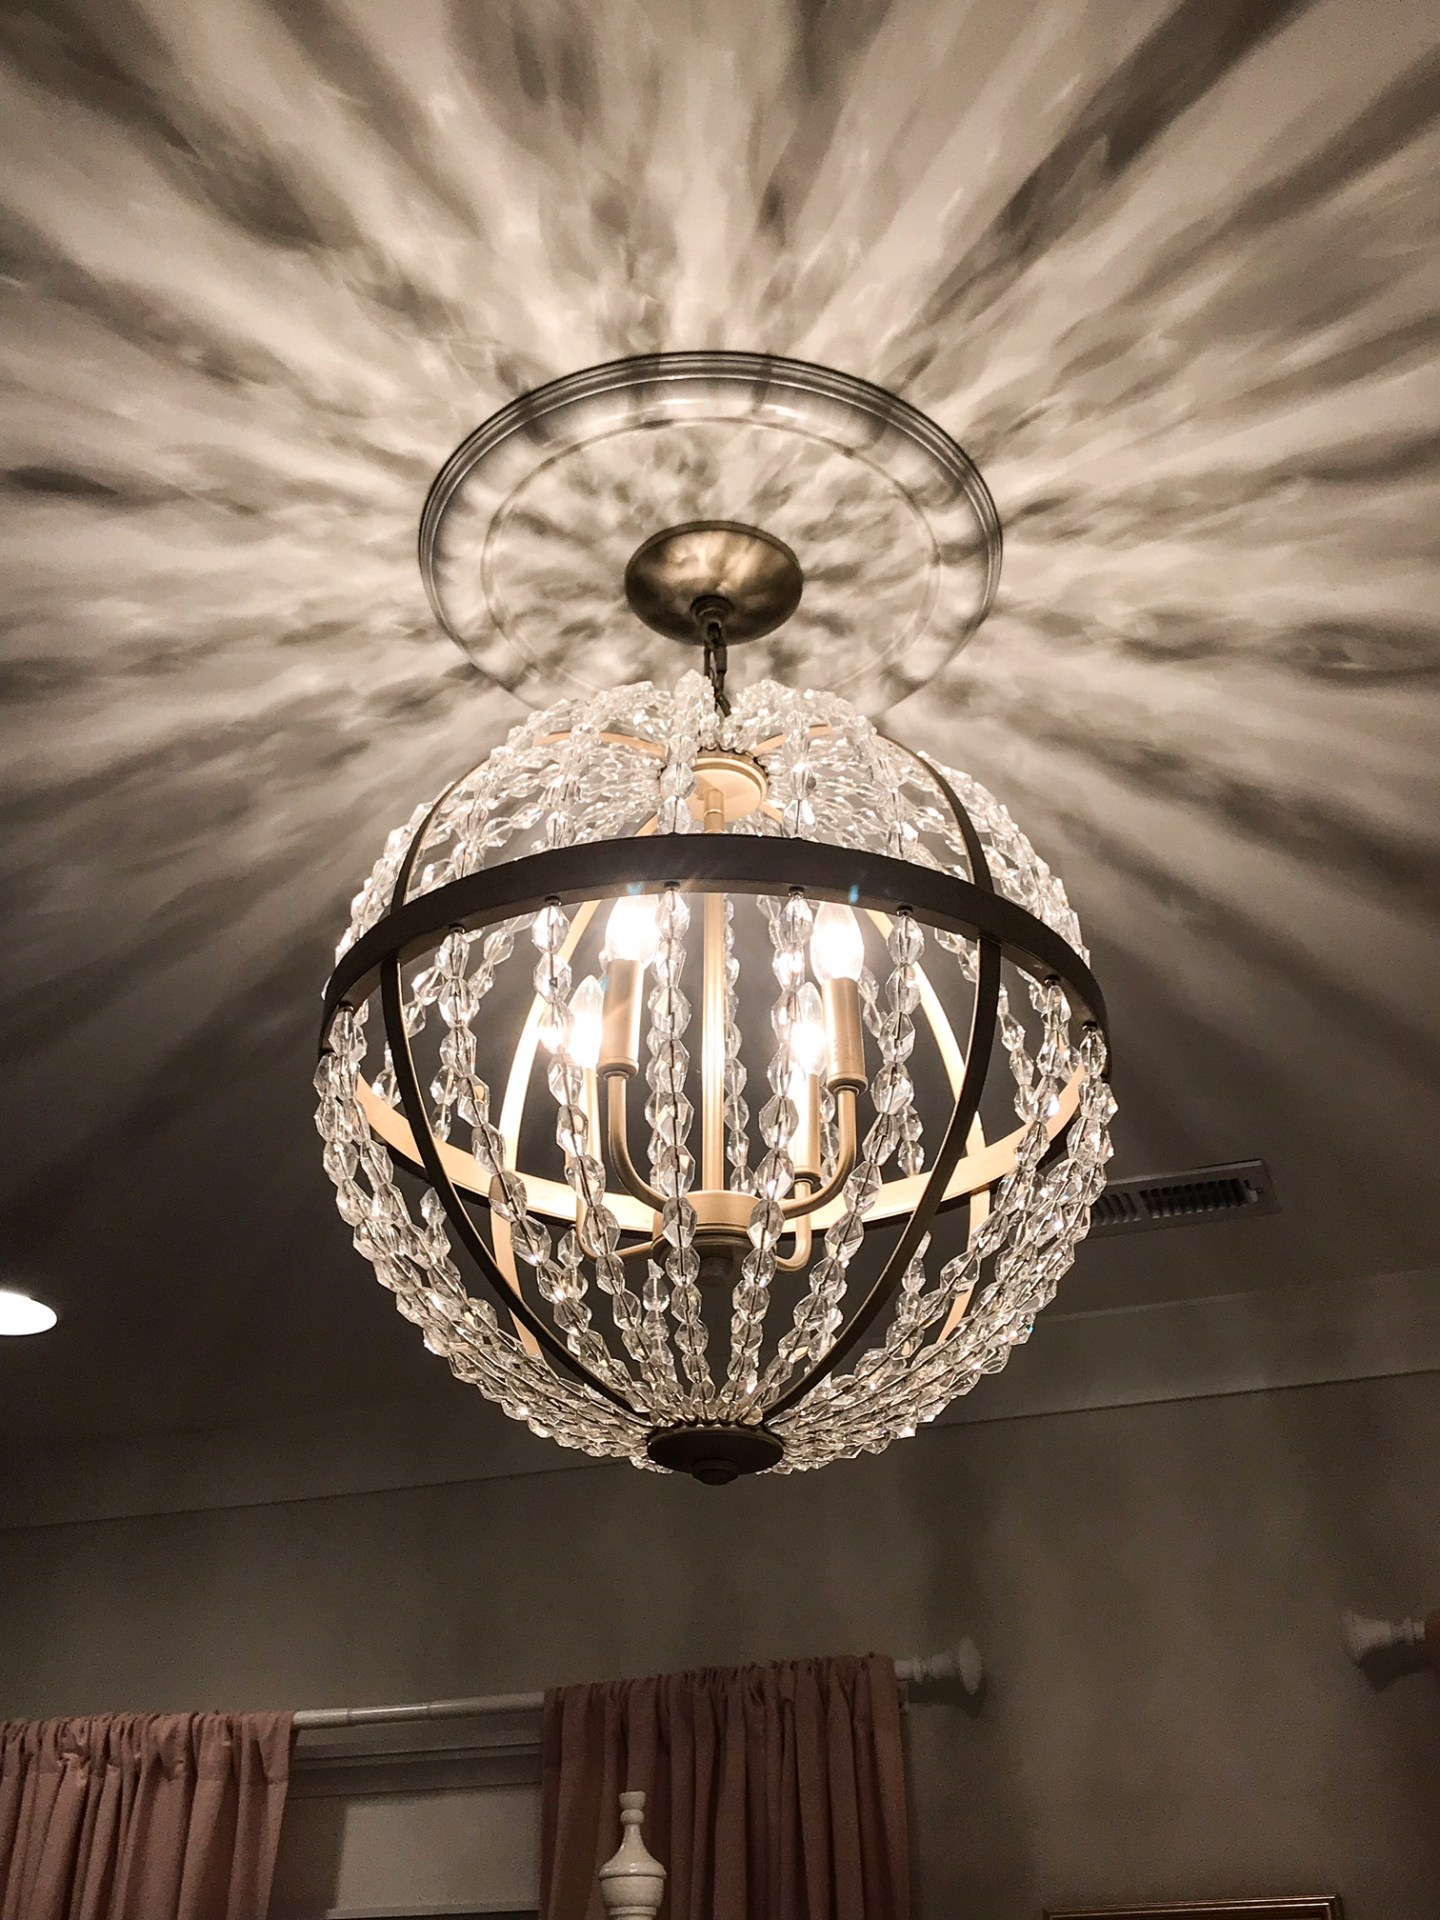 capital-lighting-fixture-gold-crystal